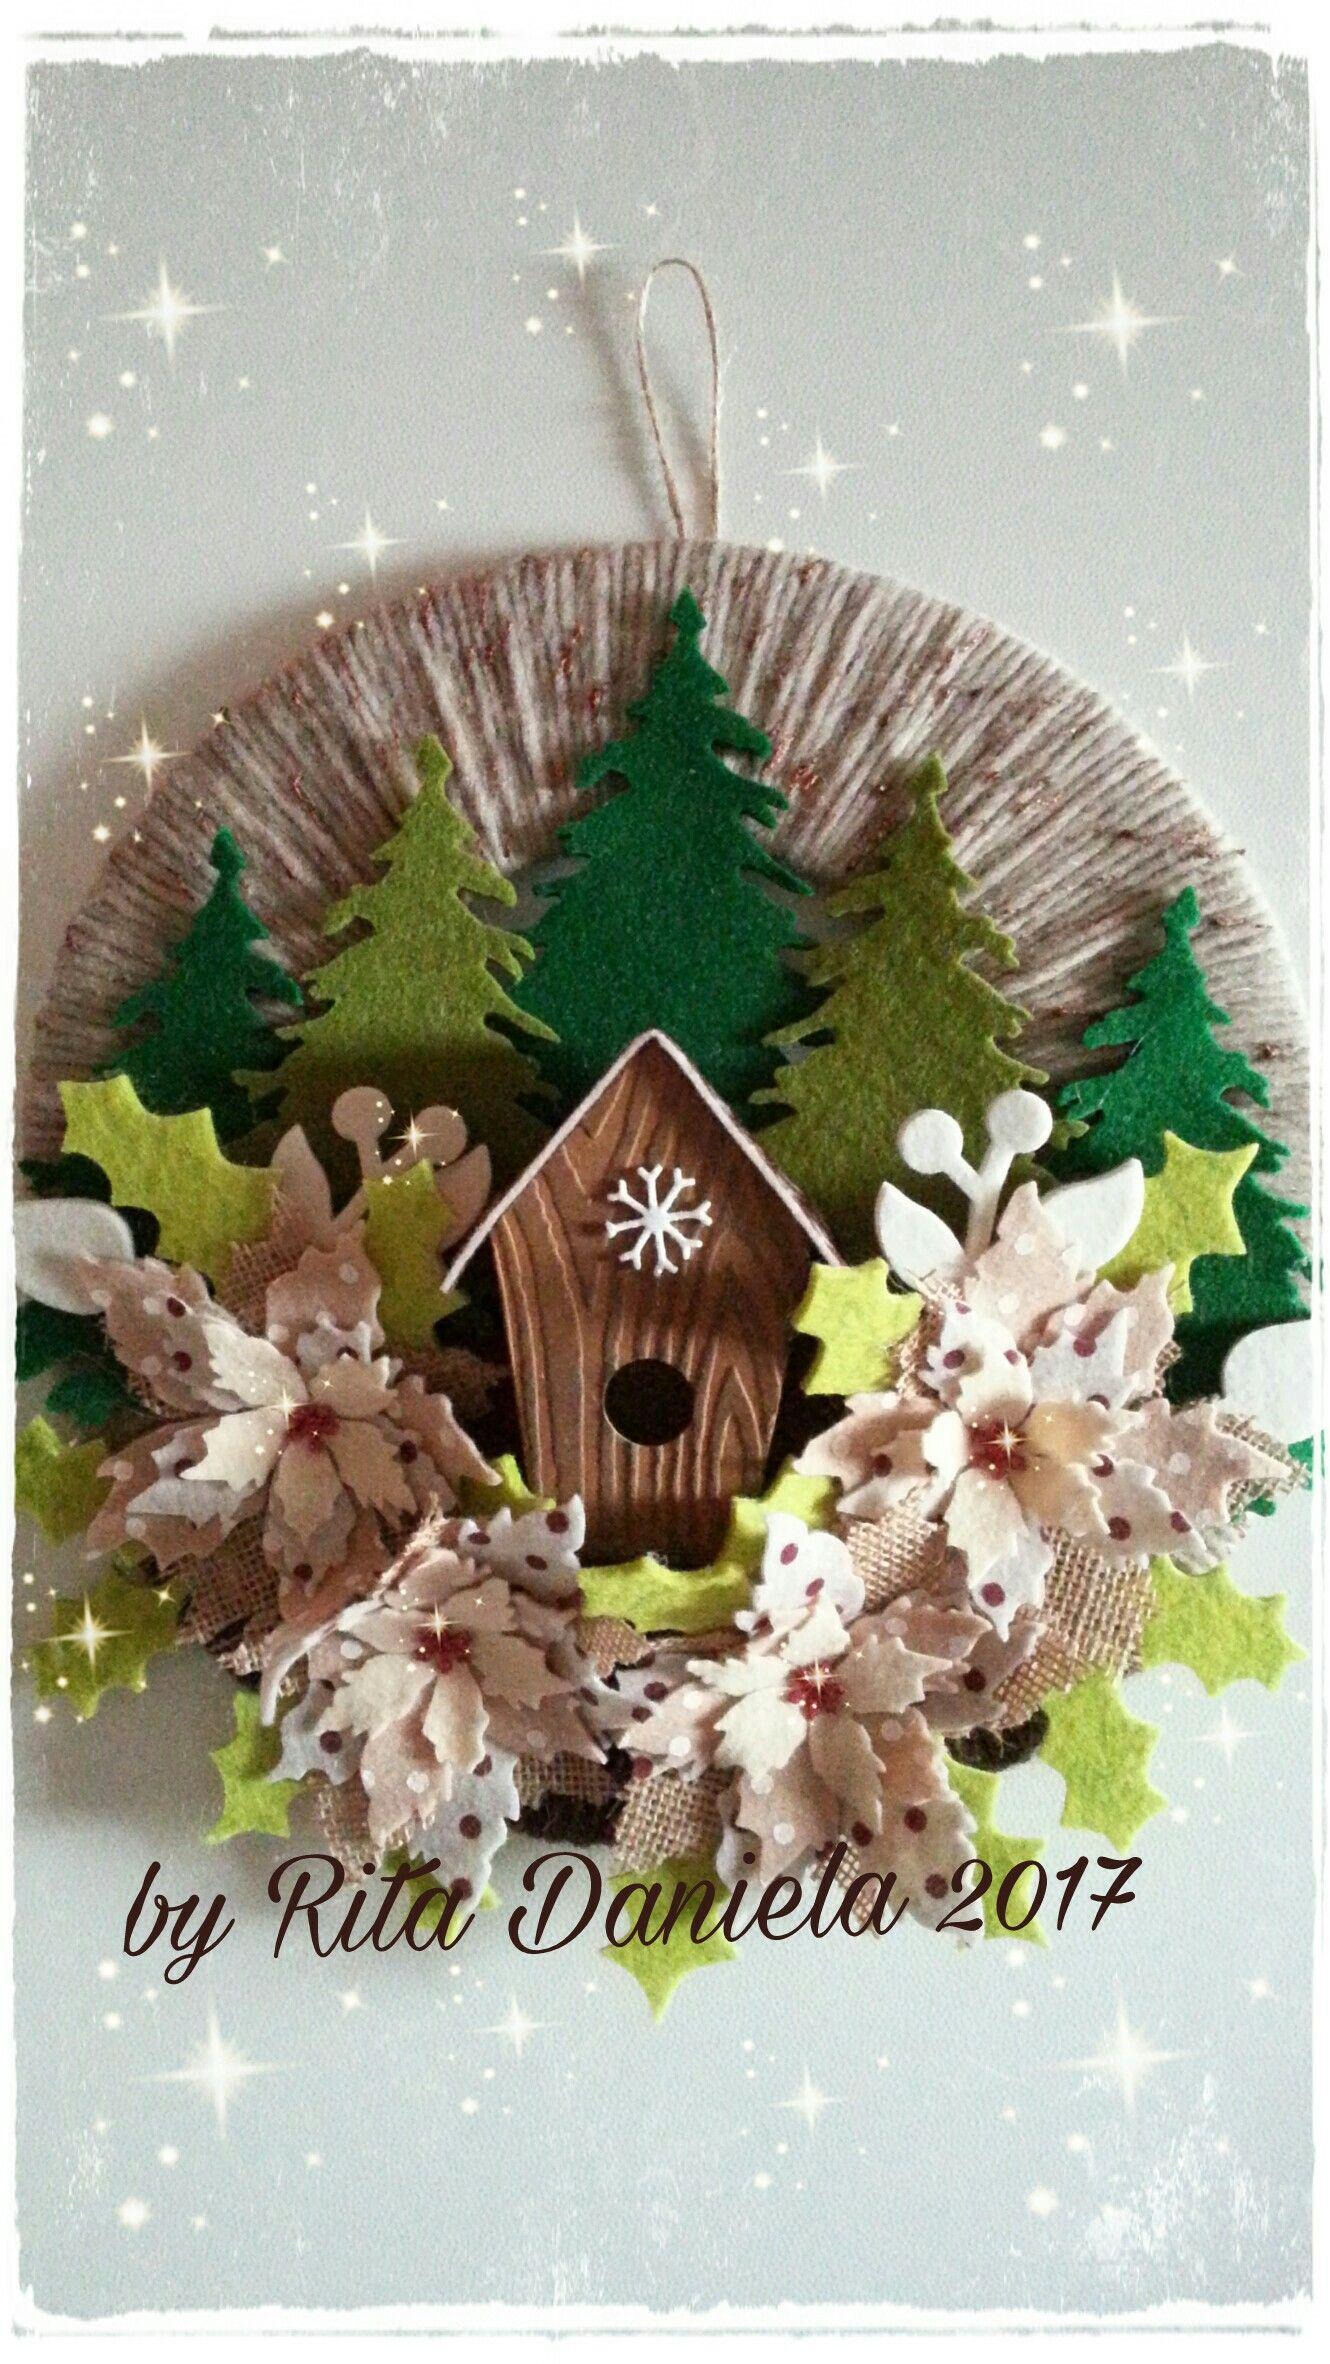 Addobbi Natalizi Feltro.Fuoriporta Natalizio Natale Feltro Pannolenci Wreaths